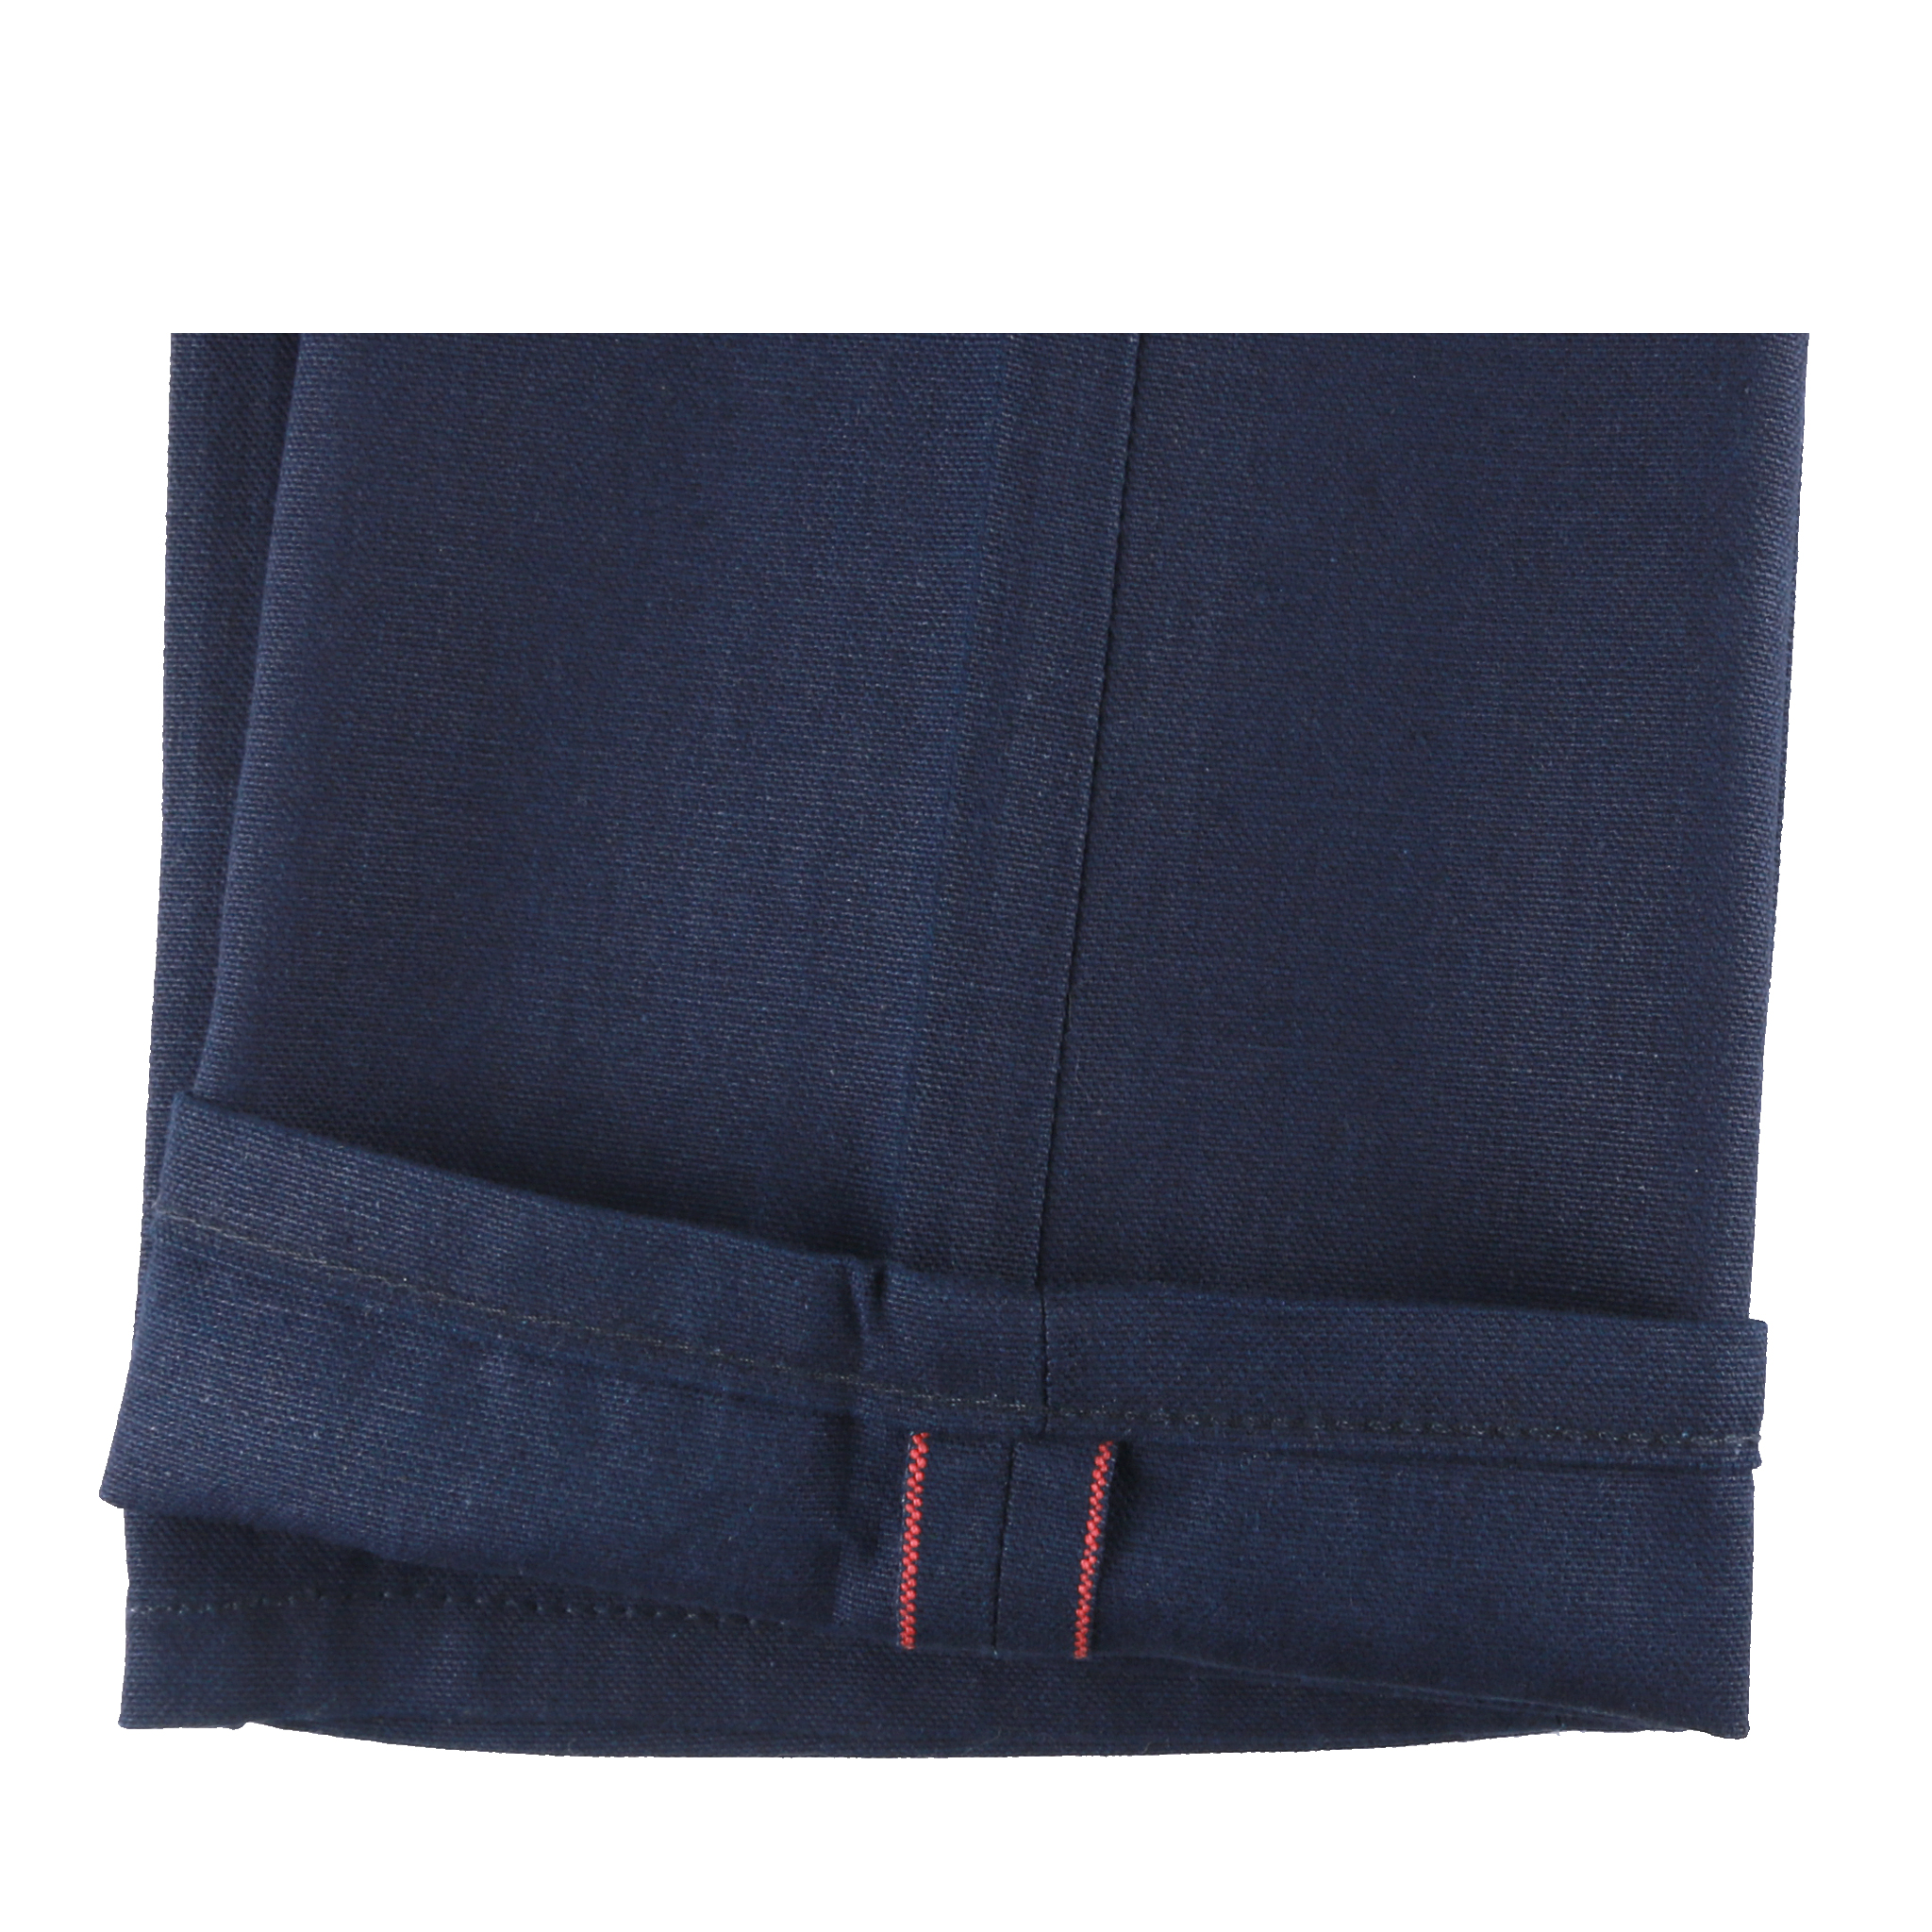 Indigo Duck Canvas Selvedge jeans hem